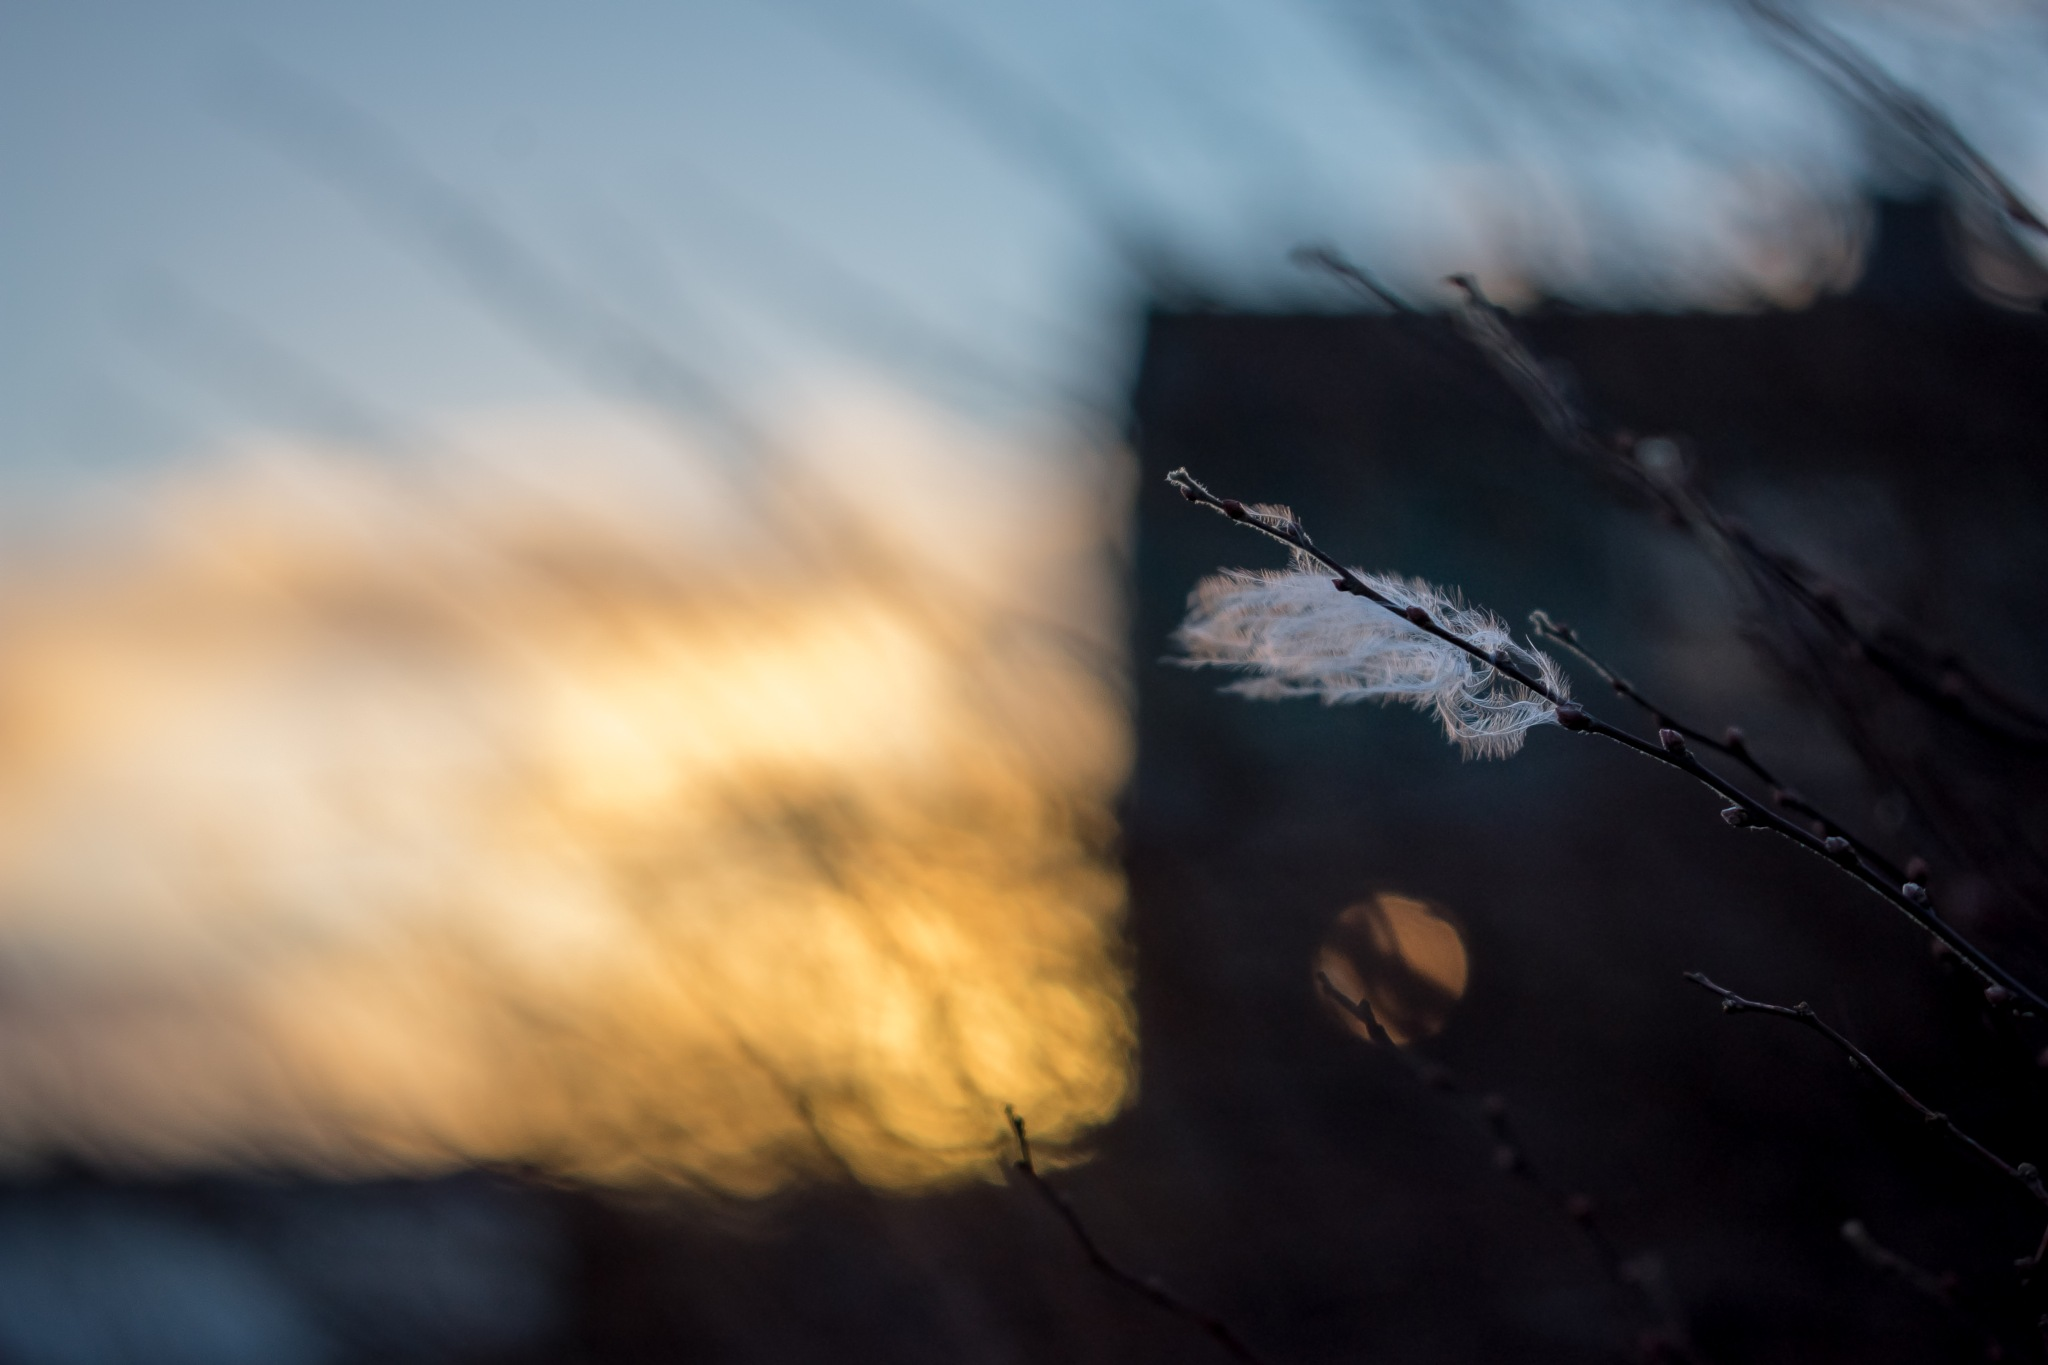 Feathery Sunset by Daniel Eikehaugen Solbakk